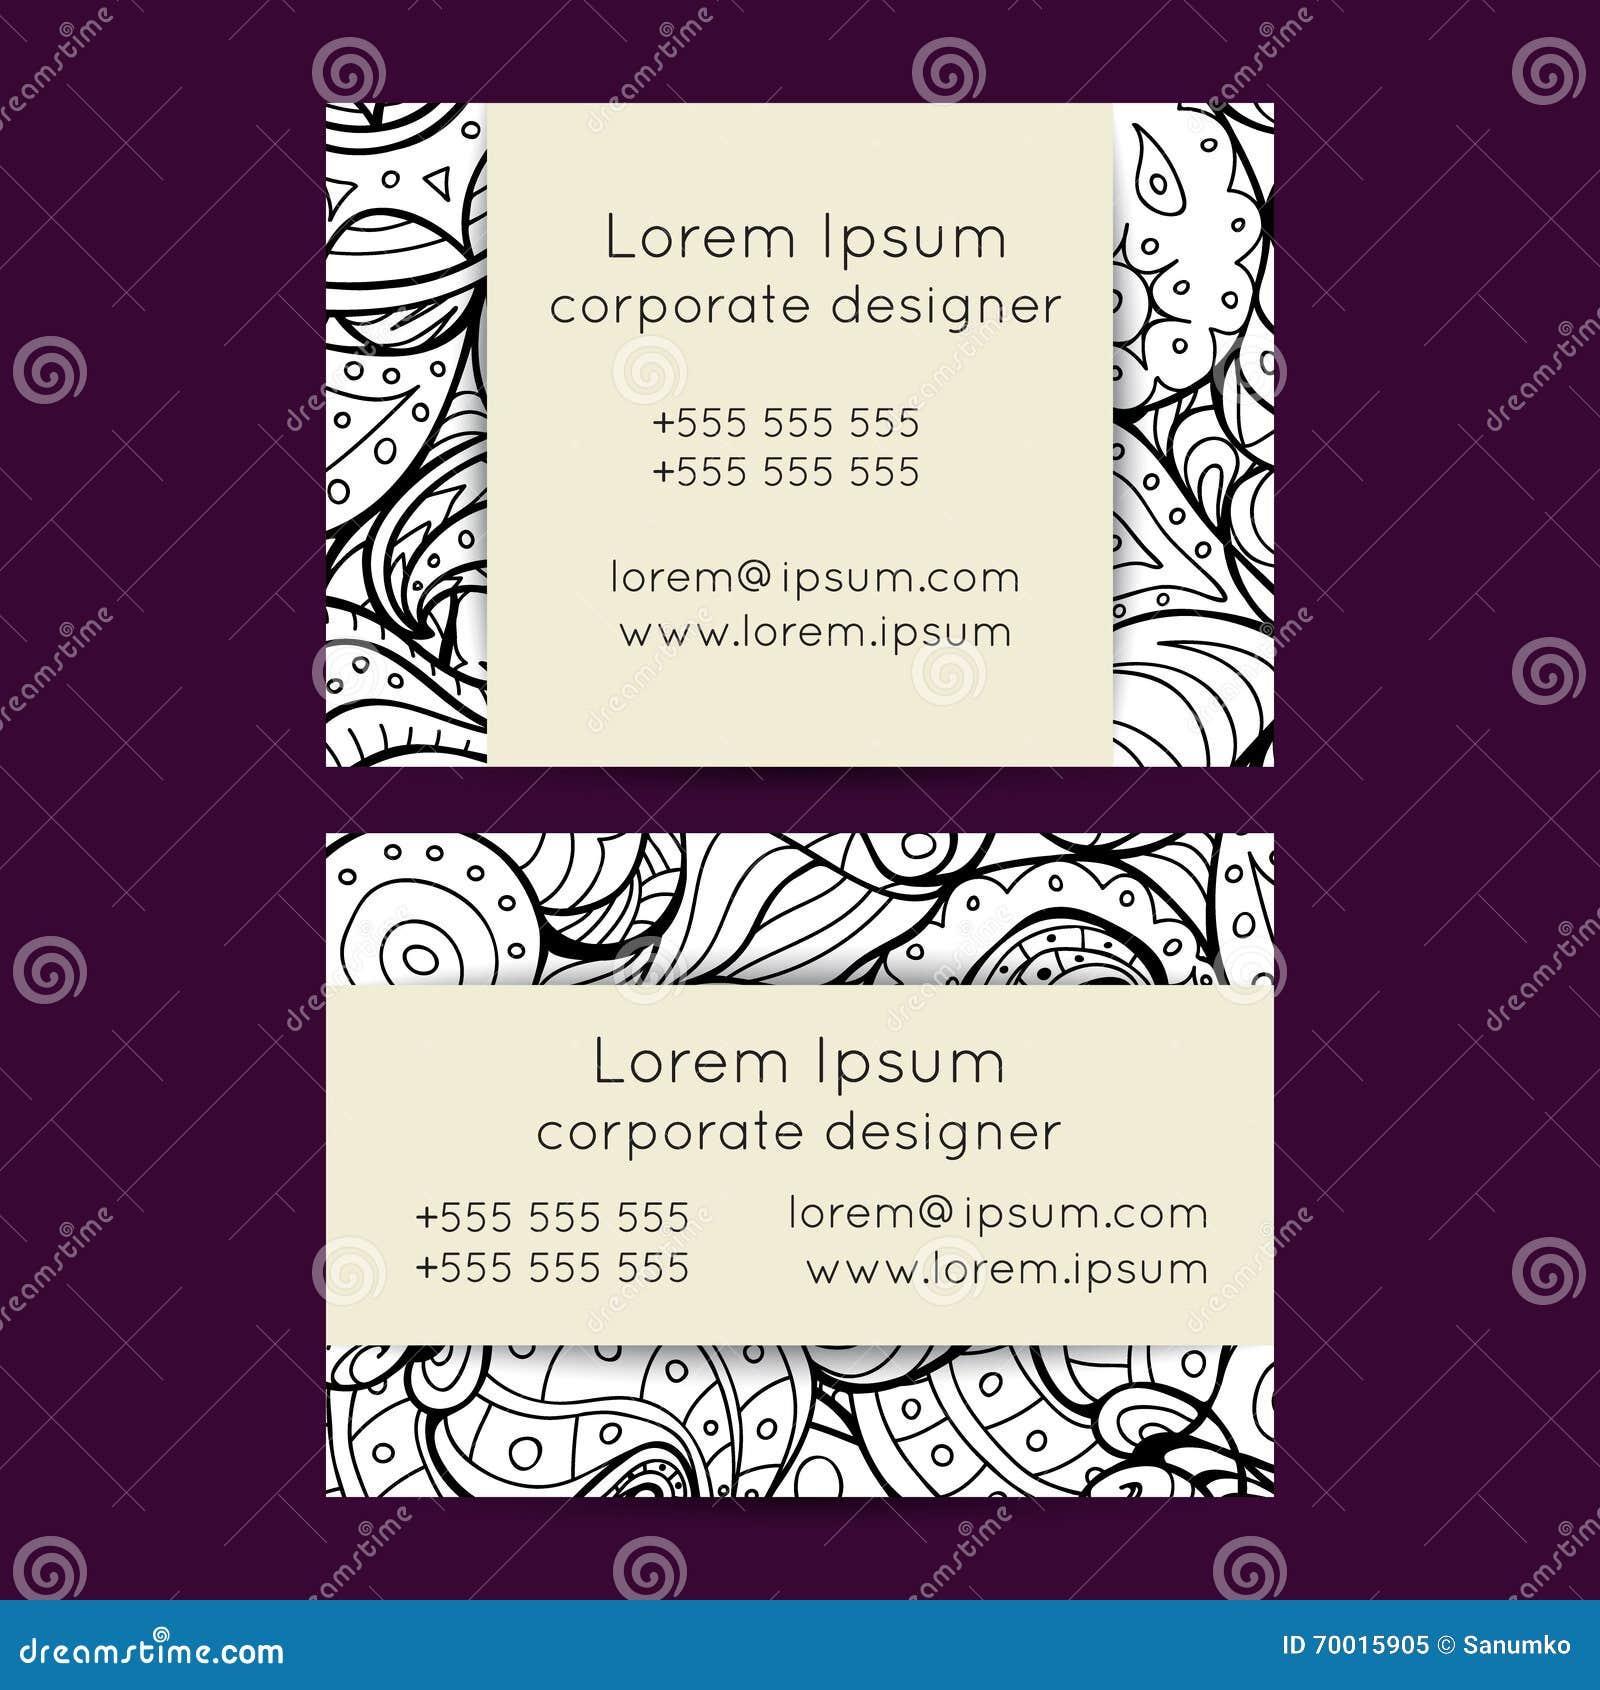 Boho black and white paisley business cards templates stock vector boho black and white paisley business cards templates magicingreecefo Images